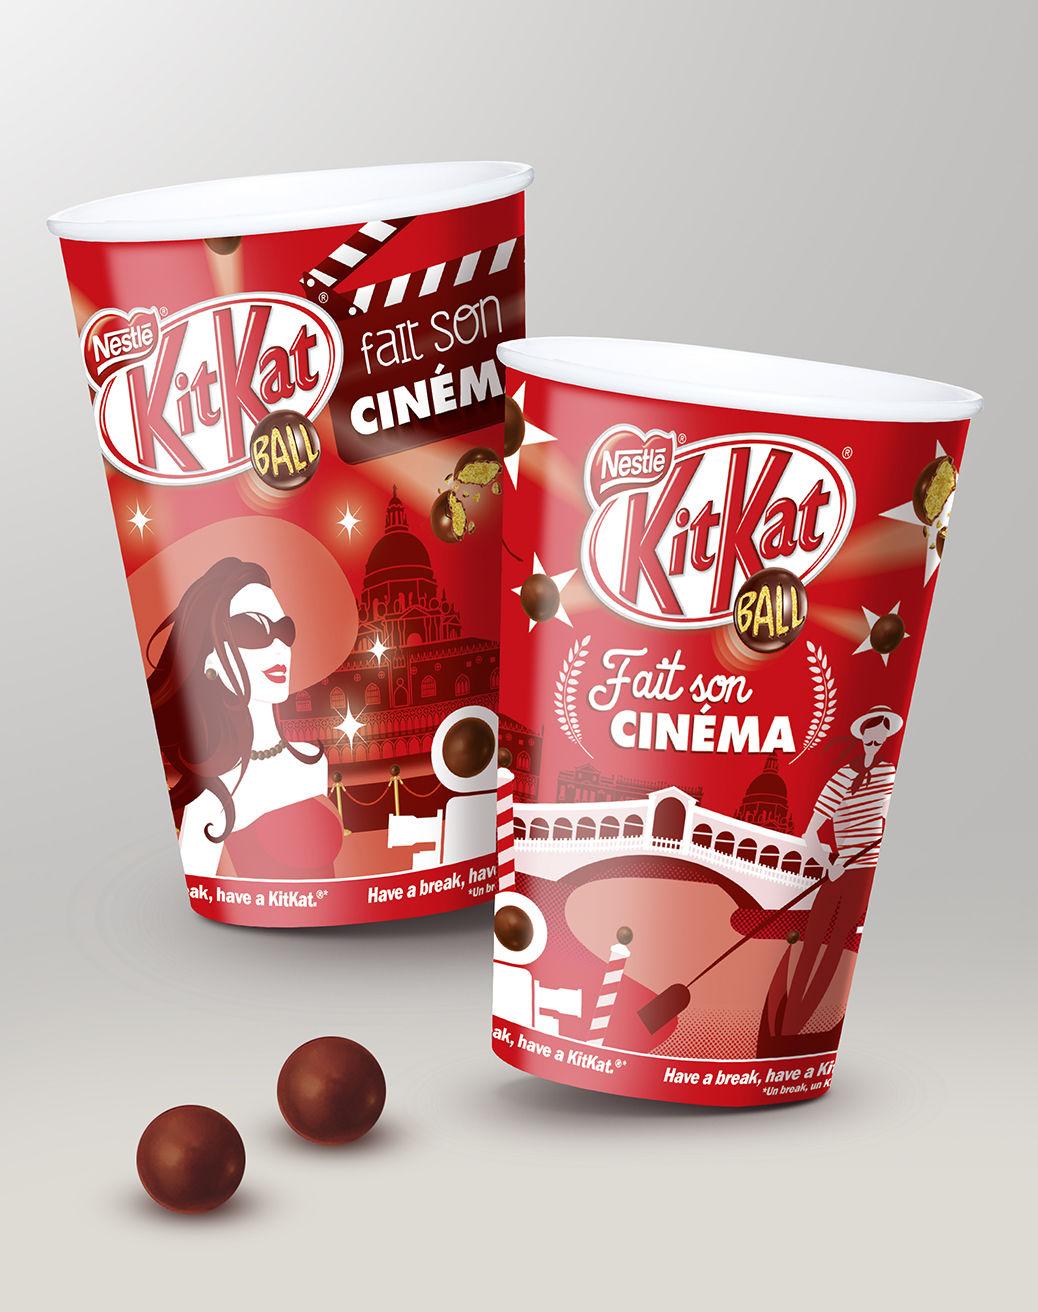 Illustration KitKat Ball